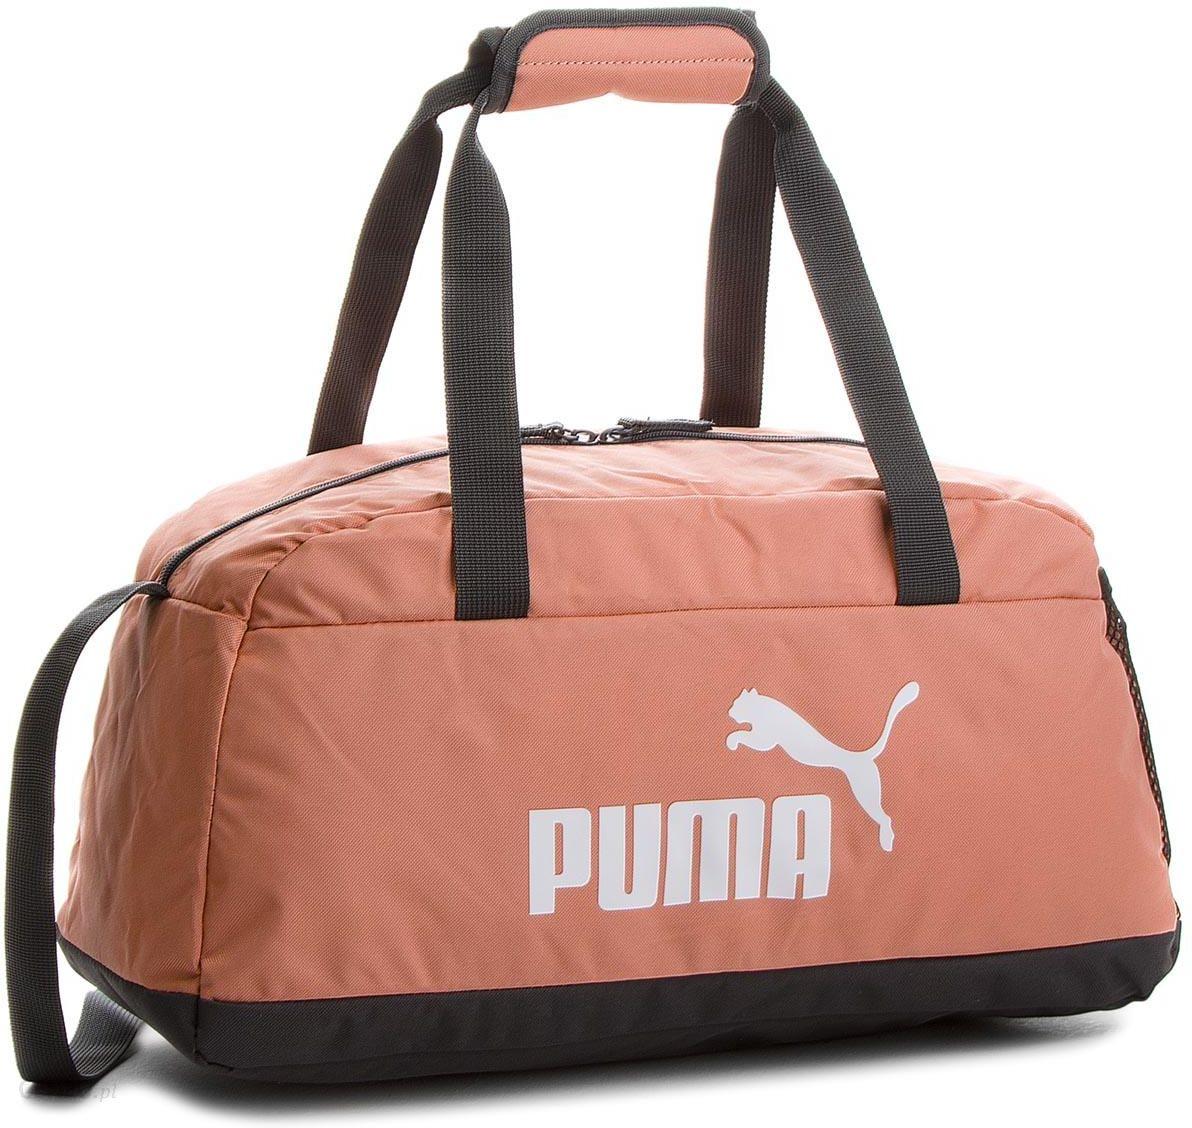 83691cda890d3 Torba PUMA - Phase Sport Bag 074942 Peach Beige 28 - Ceny i opinie ...